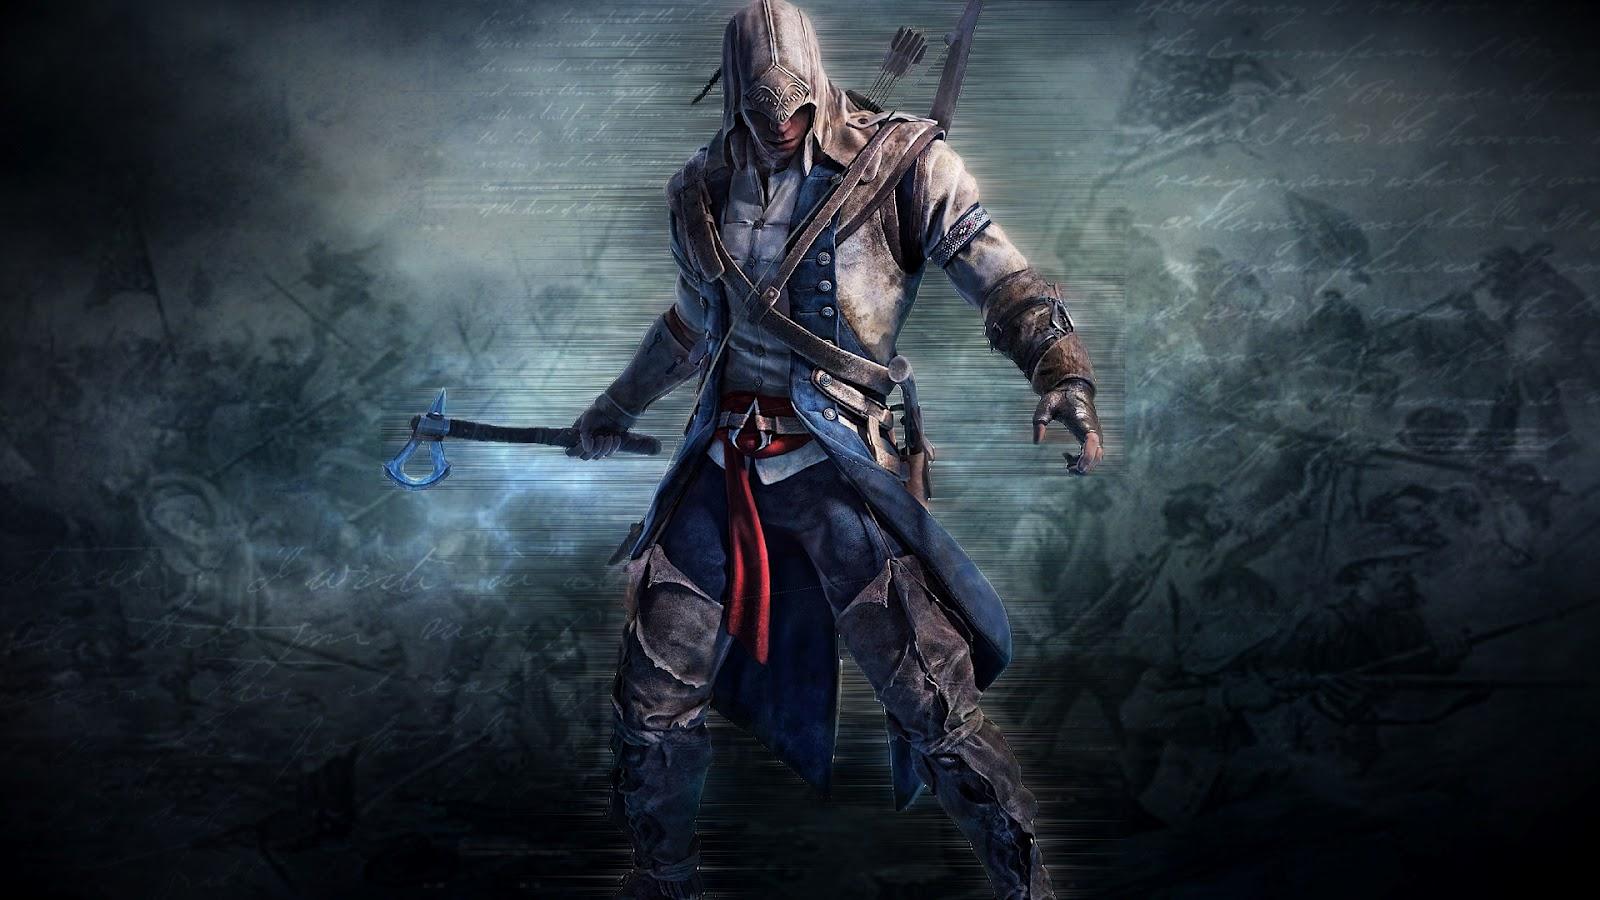 Assassins Creed Wallpaper 1080p: Assassin Creed Iii HD Wallpaper 1080p